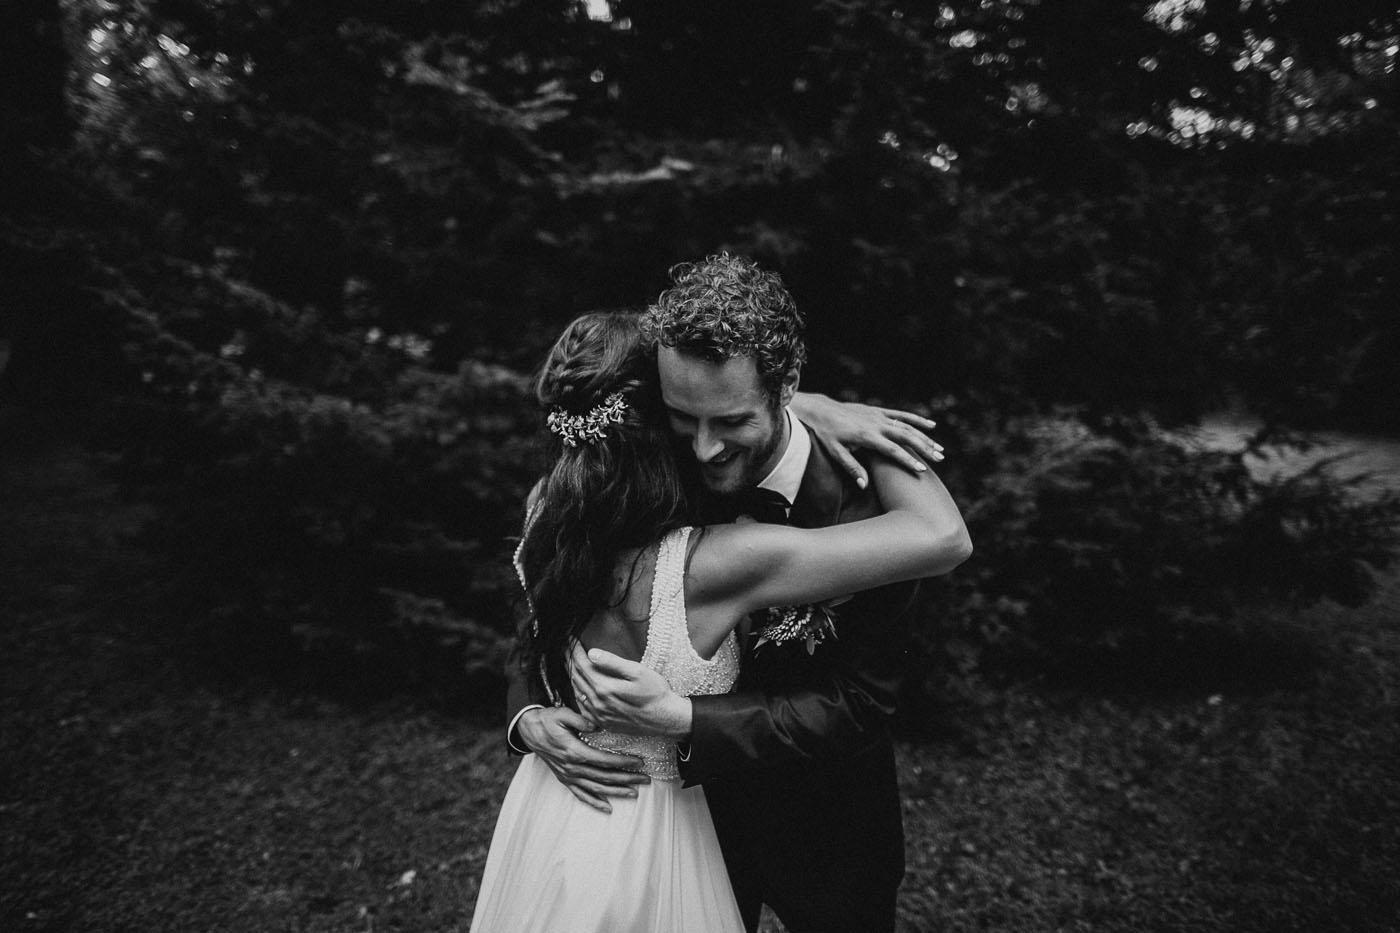 wedding-leopoldskron-photographer-45